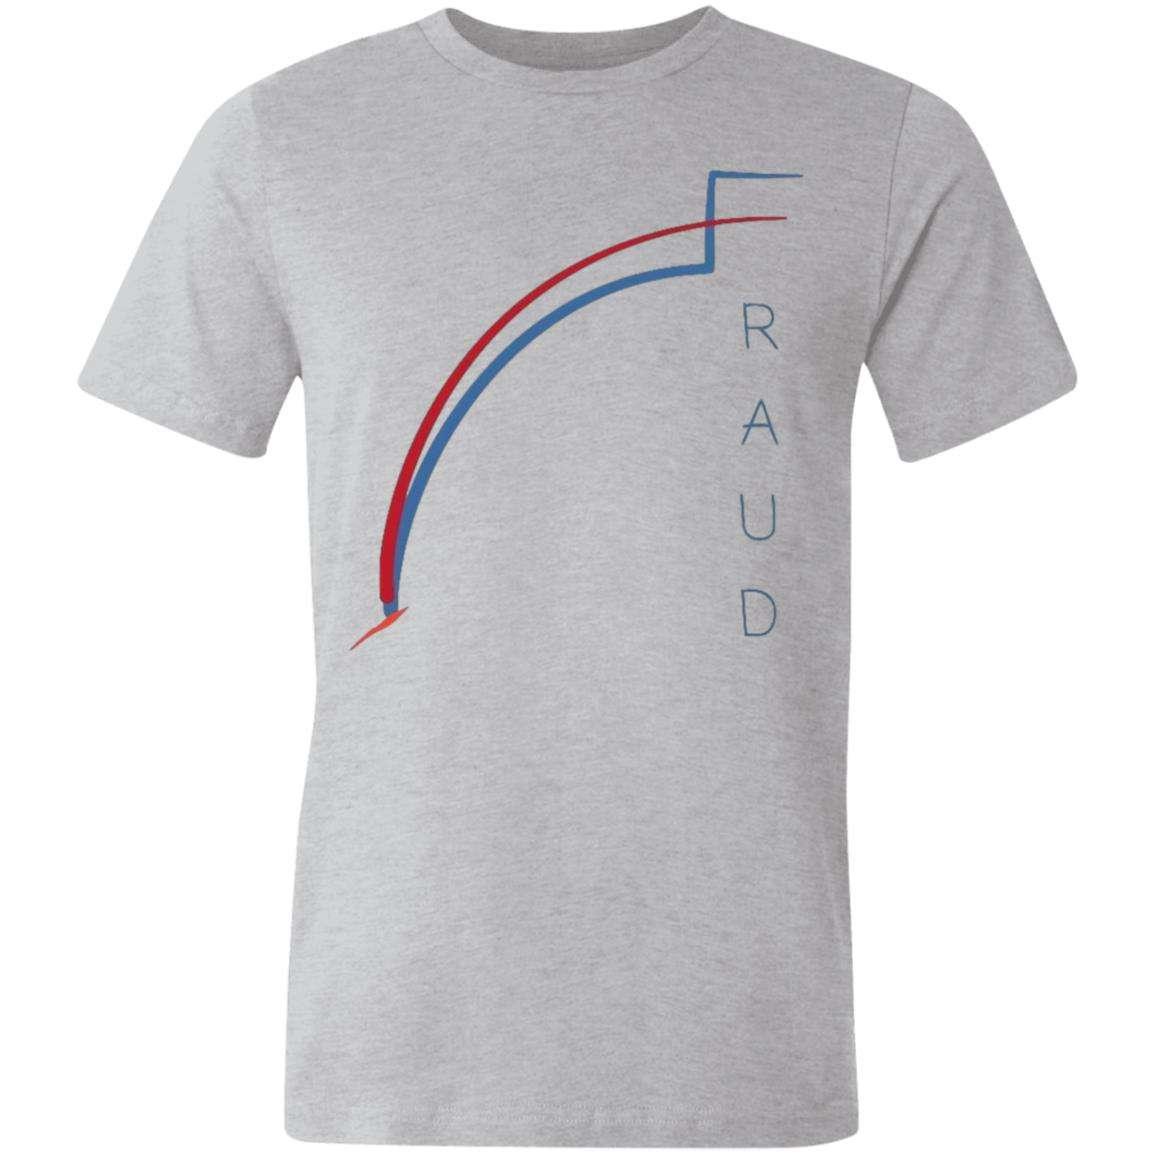 3AM Fraud T-Shirt (6 Variants)